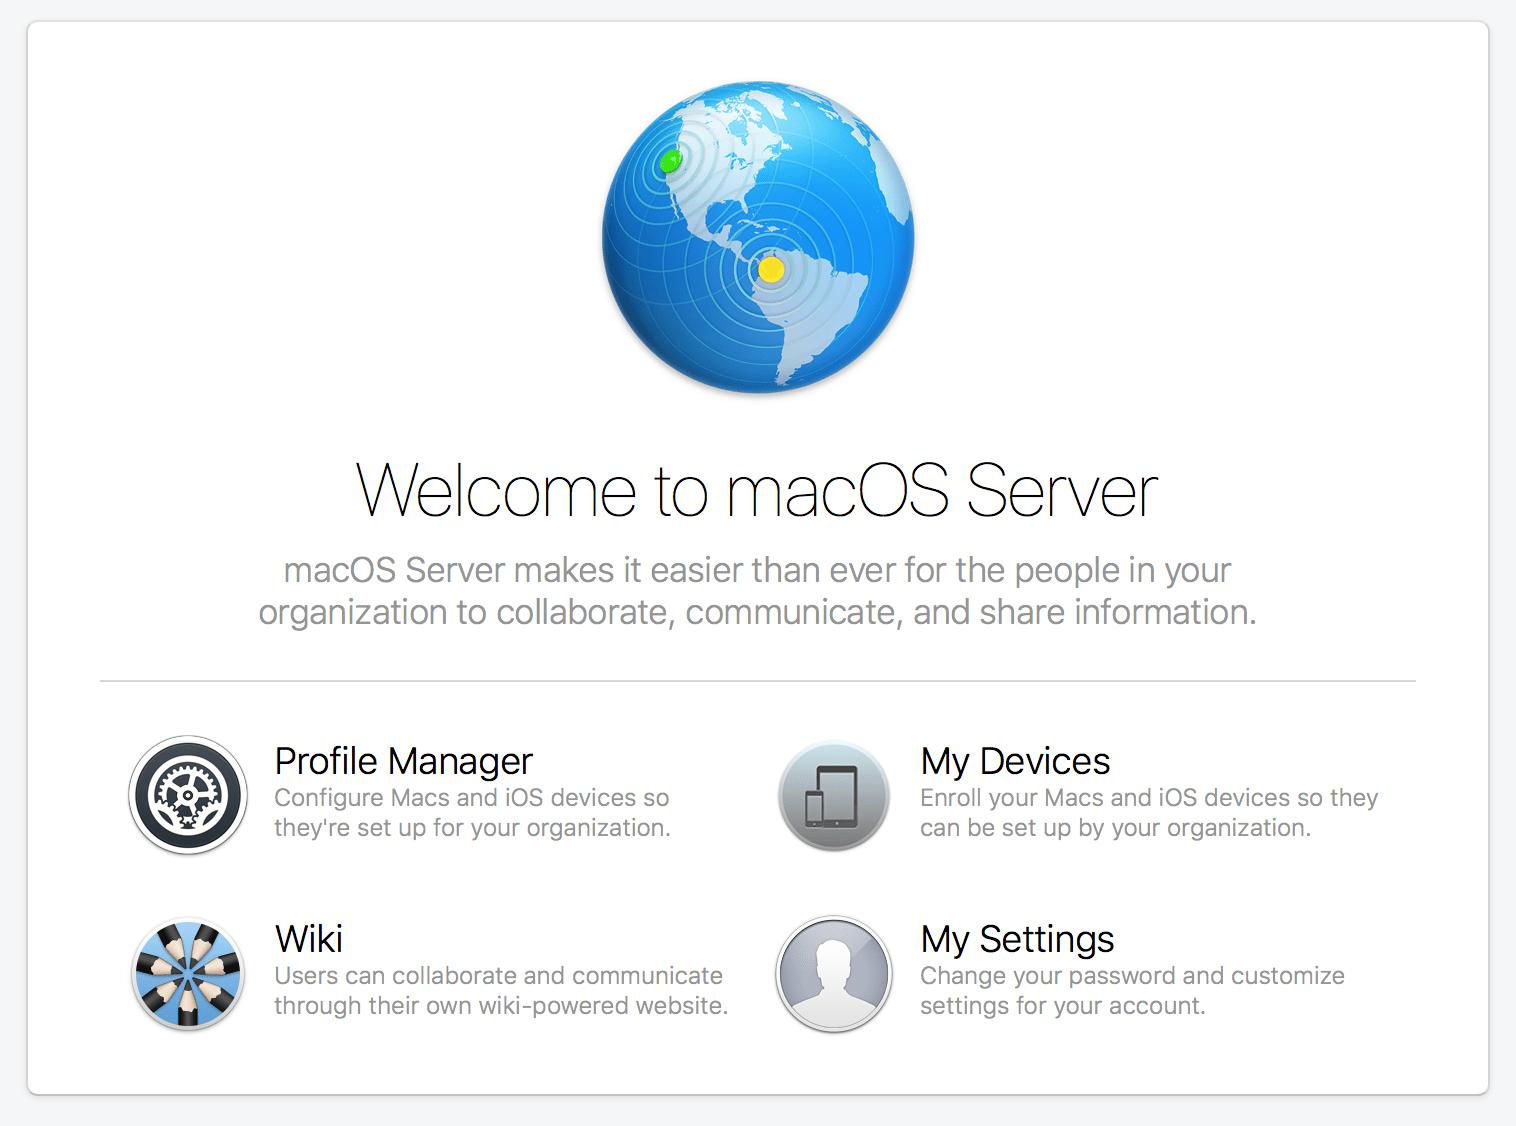 Macos server 5 3 Archives - krypted